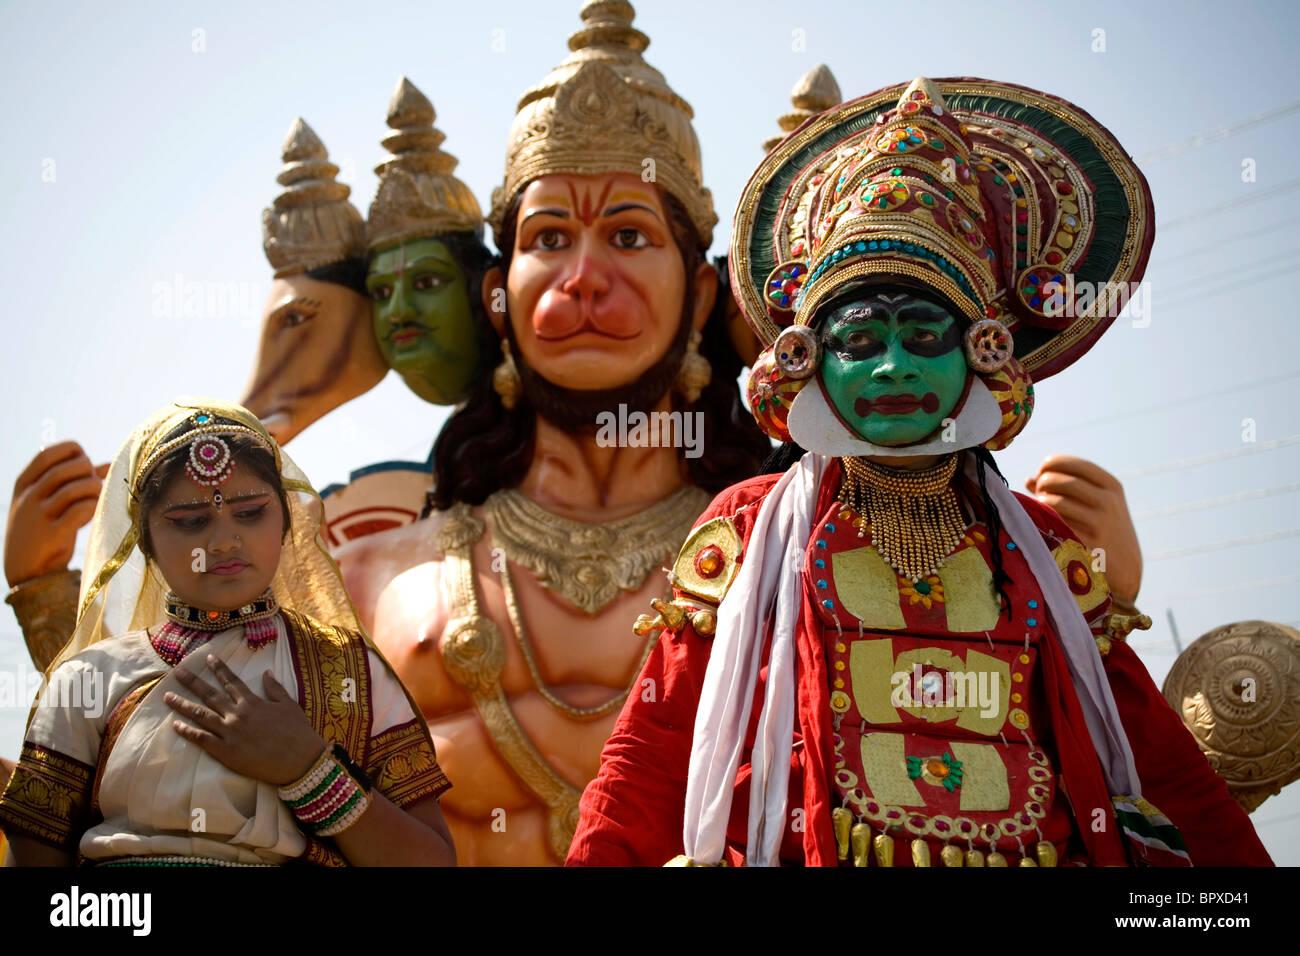 Hindu Gott Hanuman oder Affe Götter Kumbh Mela Festival Haridwar, Uttarakhand, Indien 2010. Stockbild